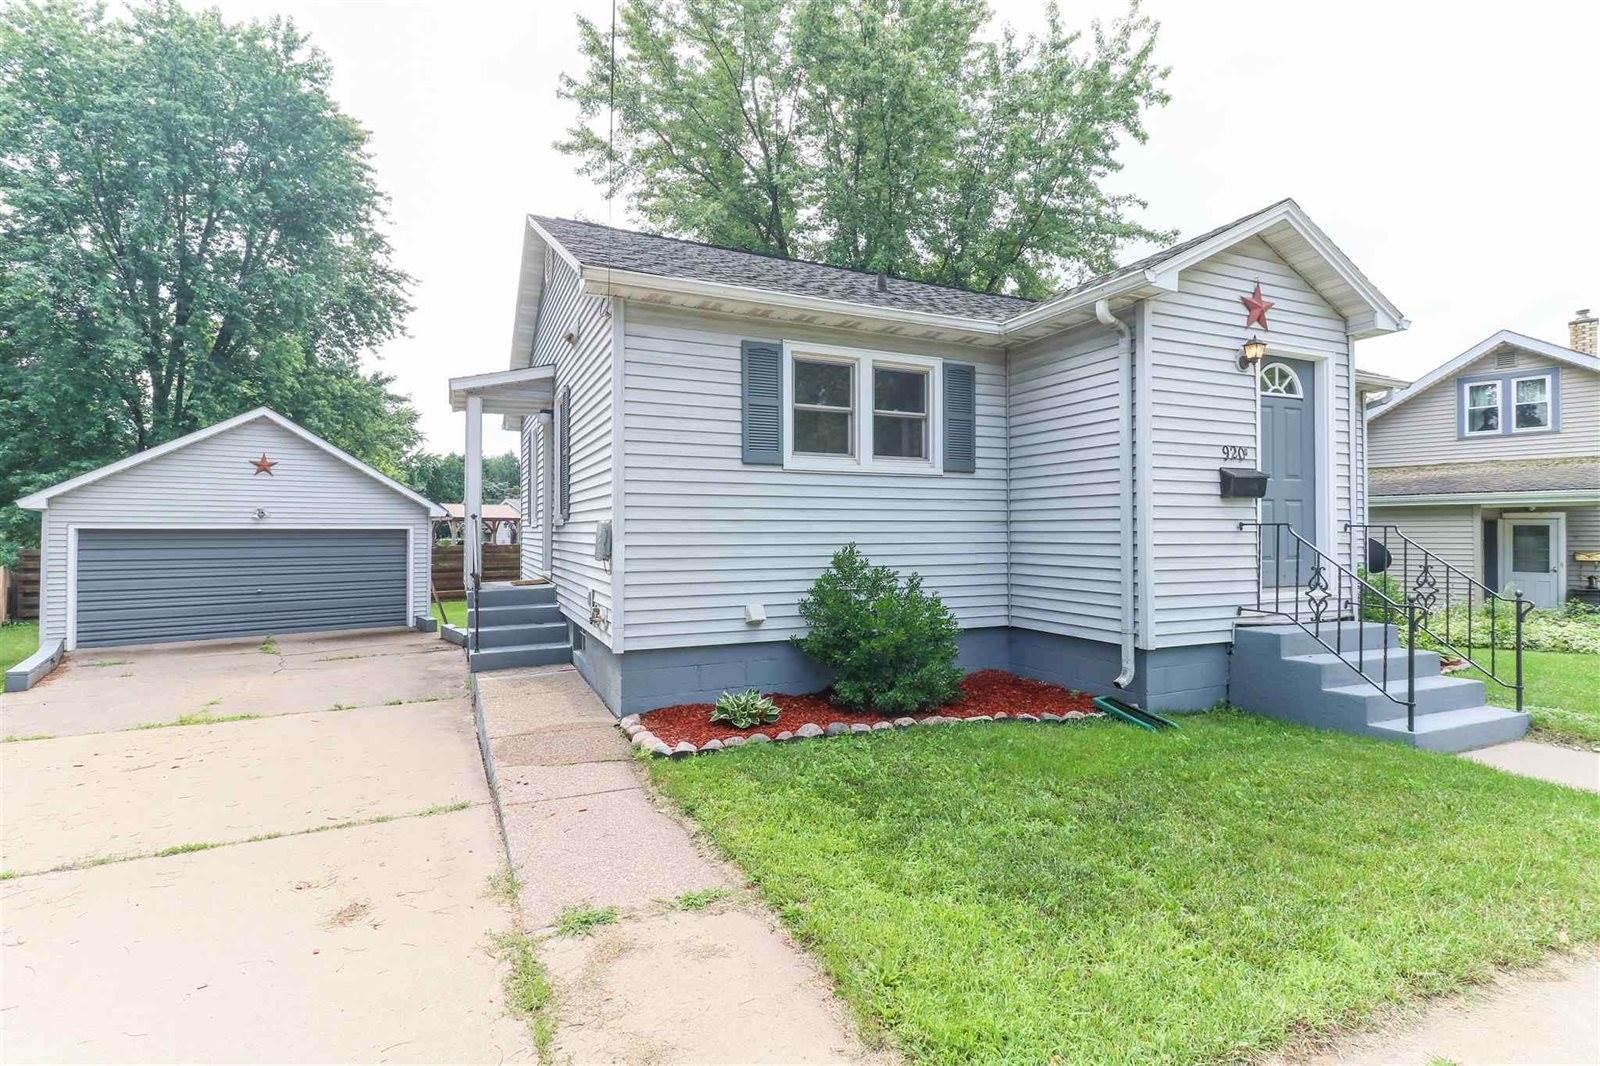 920 2nd Street North, Wisconsin Rapids, WI 54494